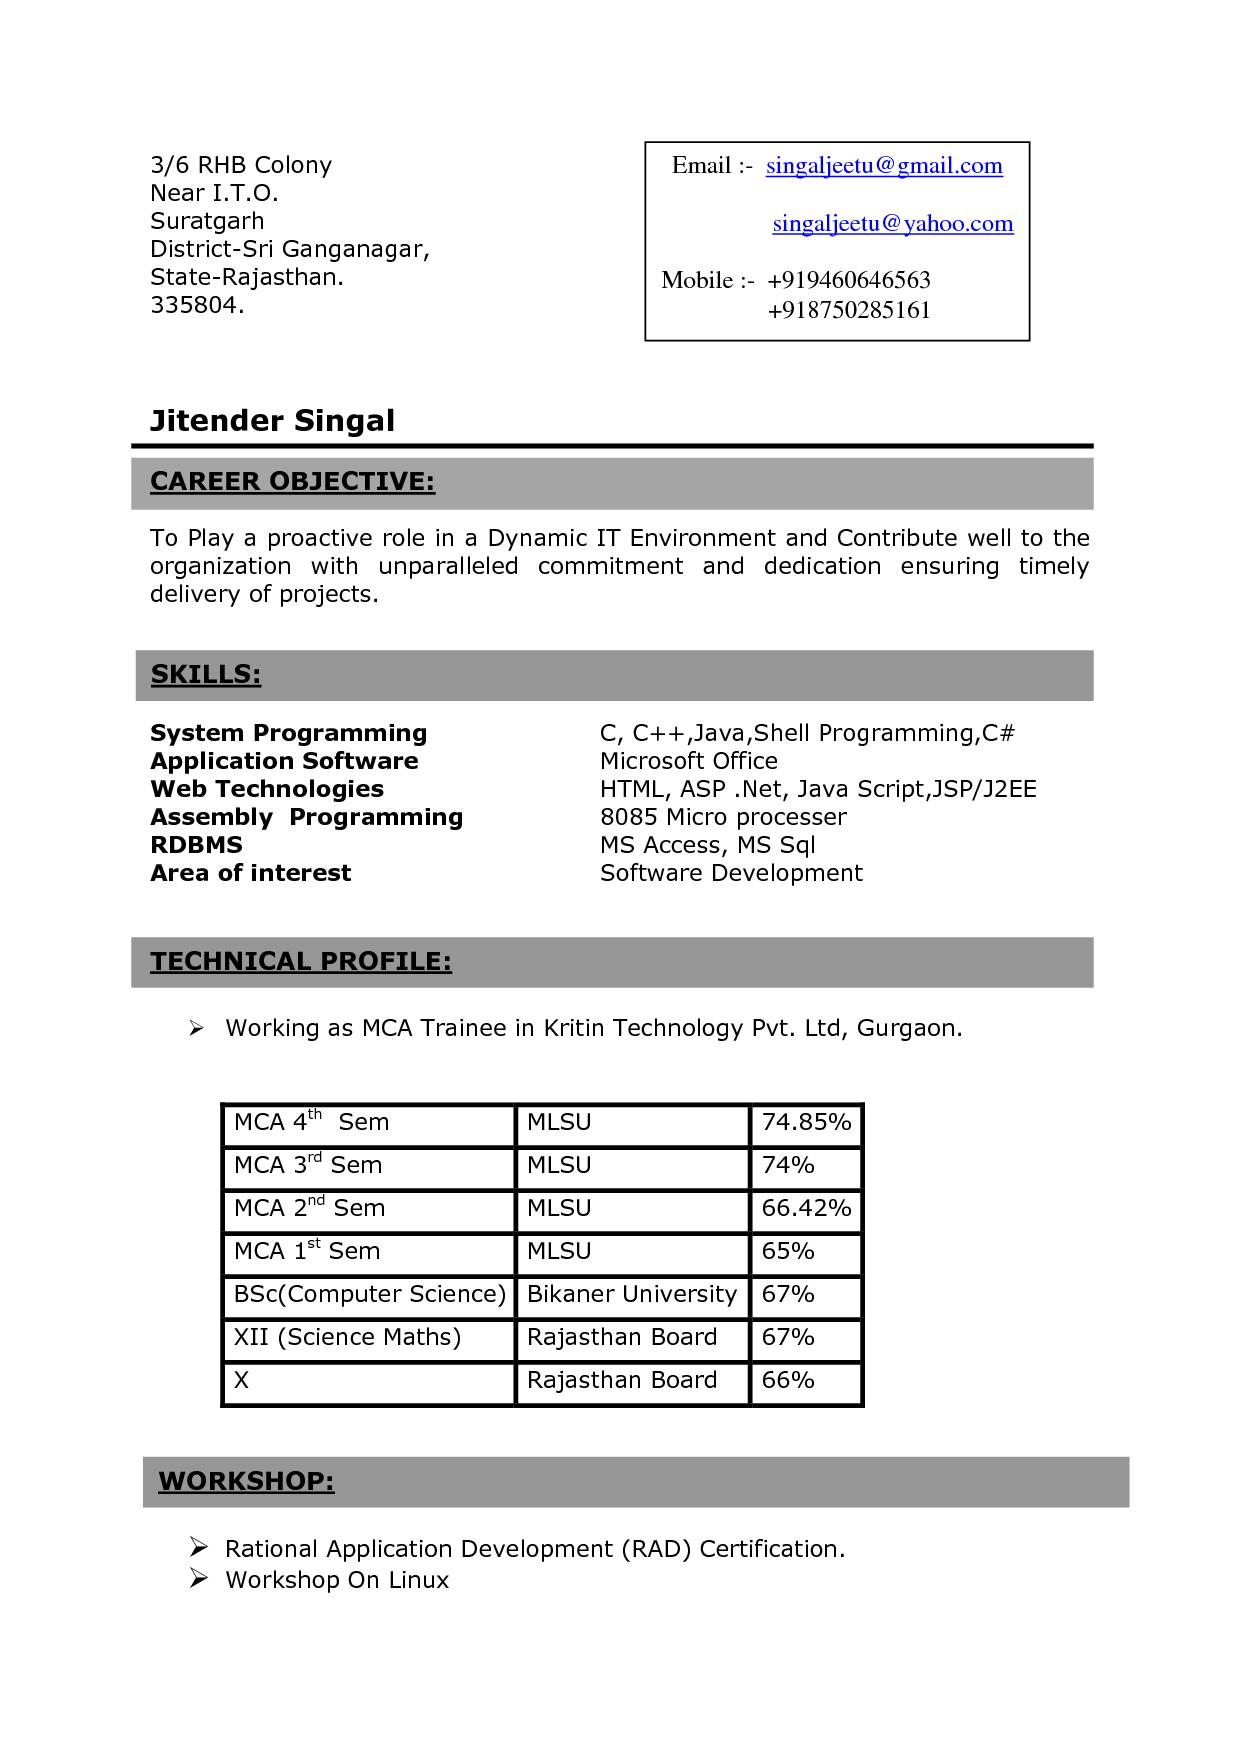 resume format for mca freshers samples